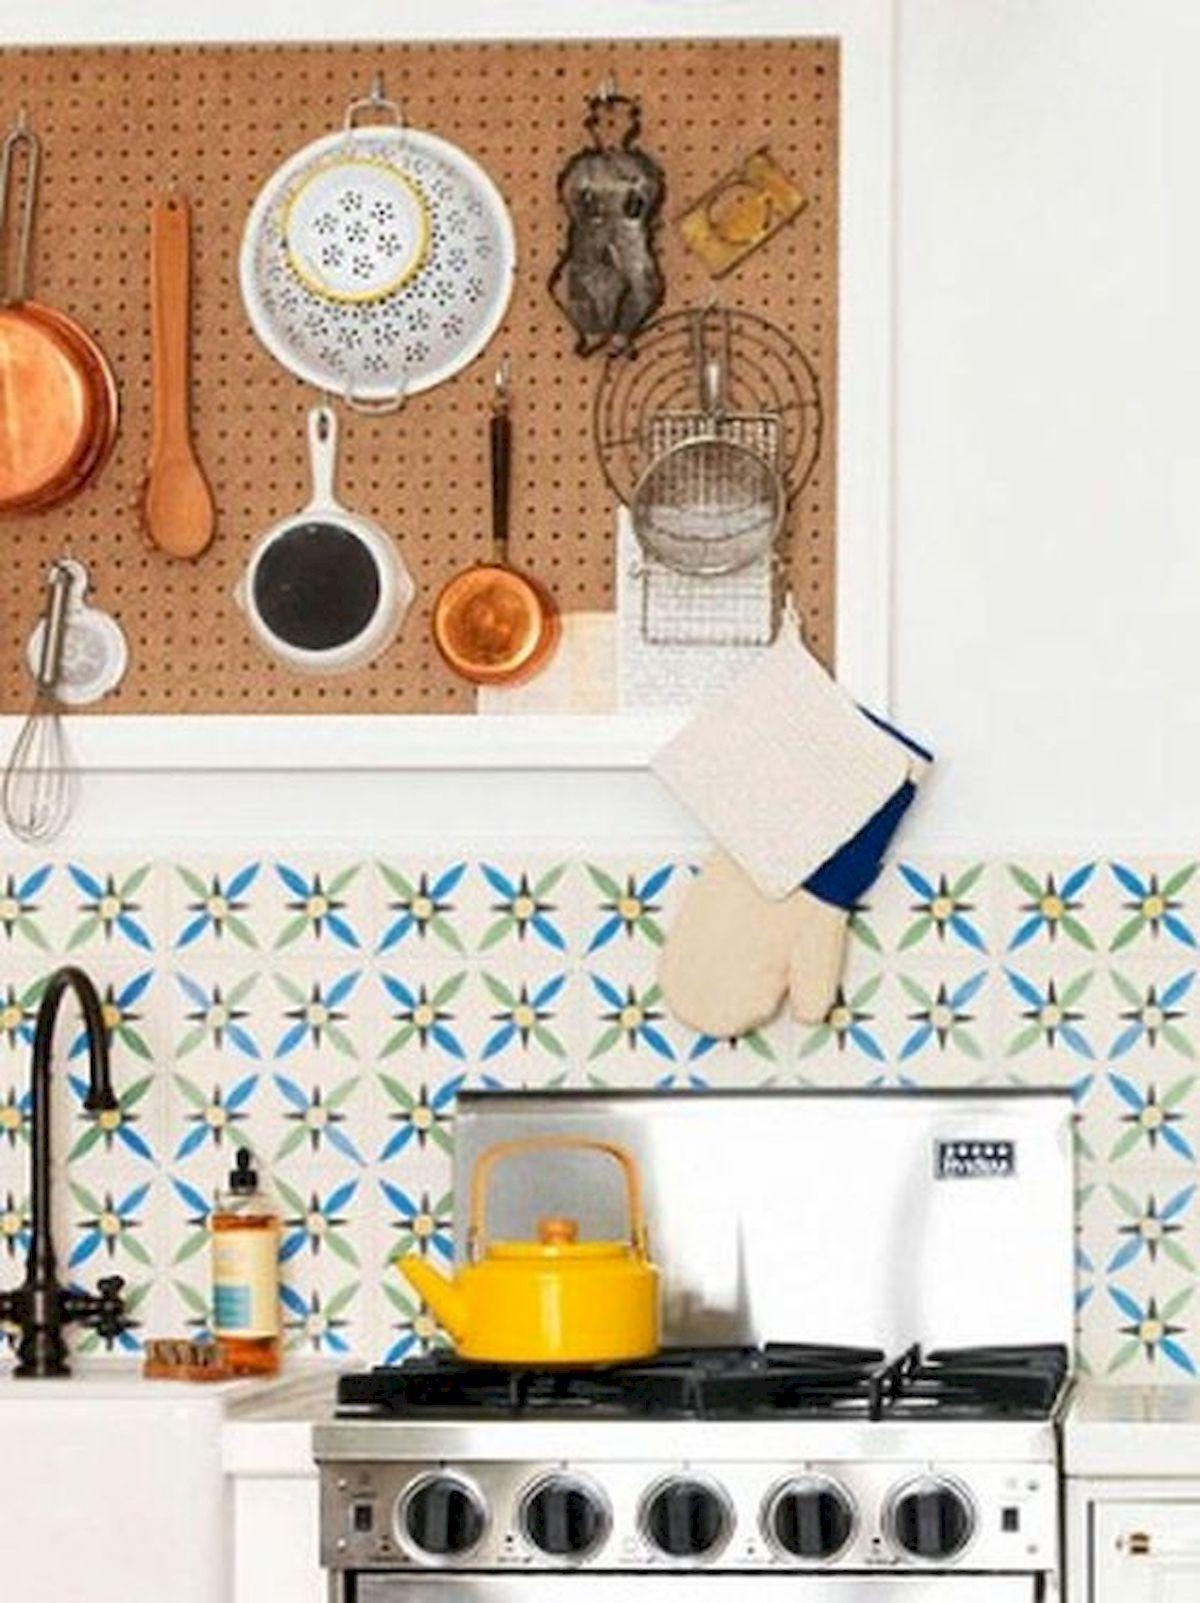 46 Easy DIY Kitchen Storage Ideas for Small Kitchen (15)